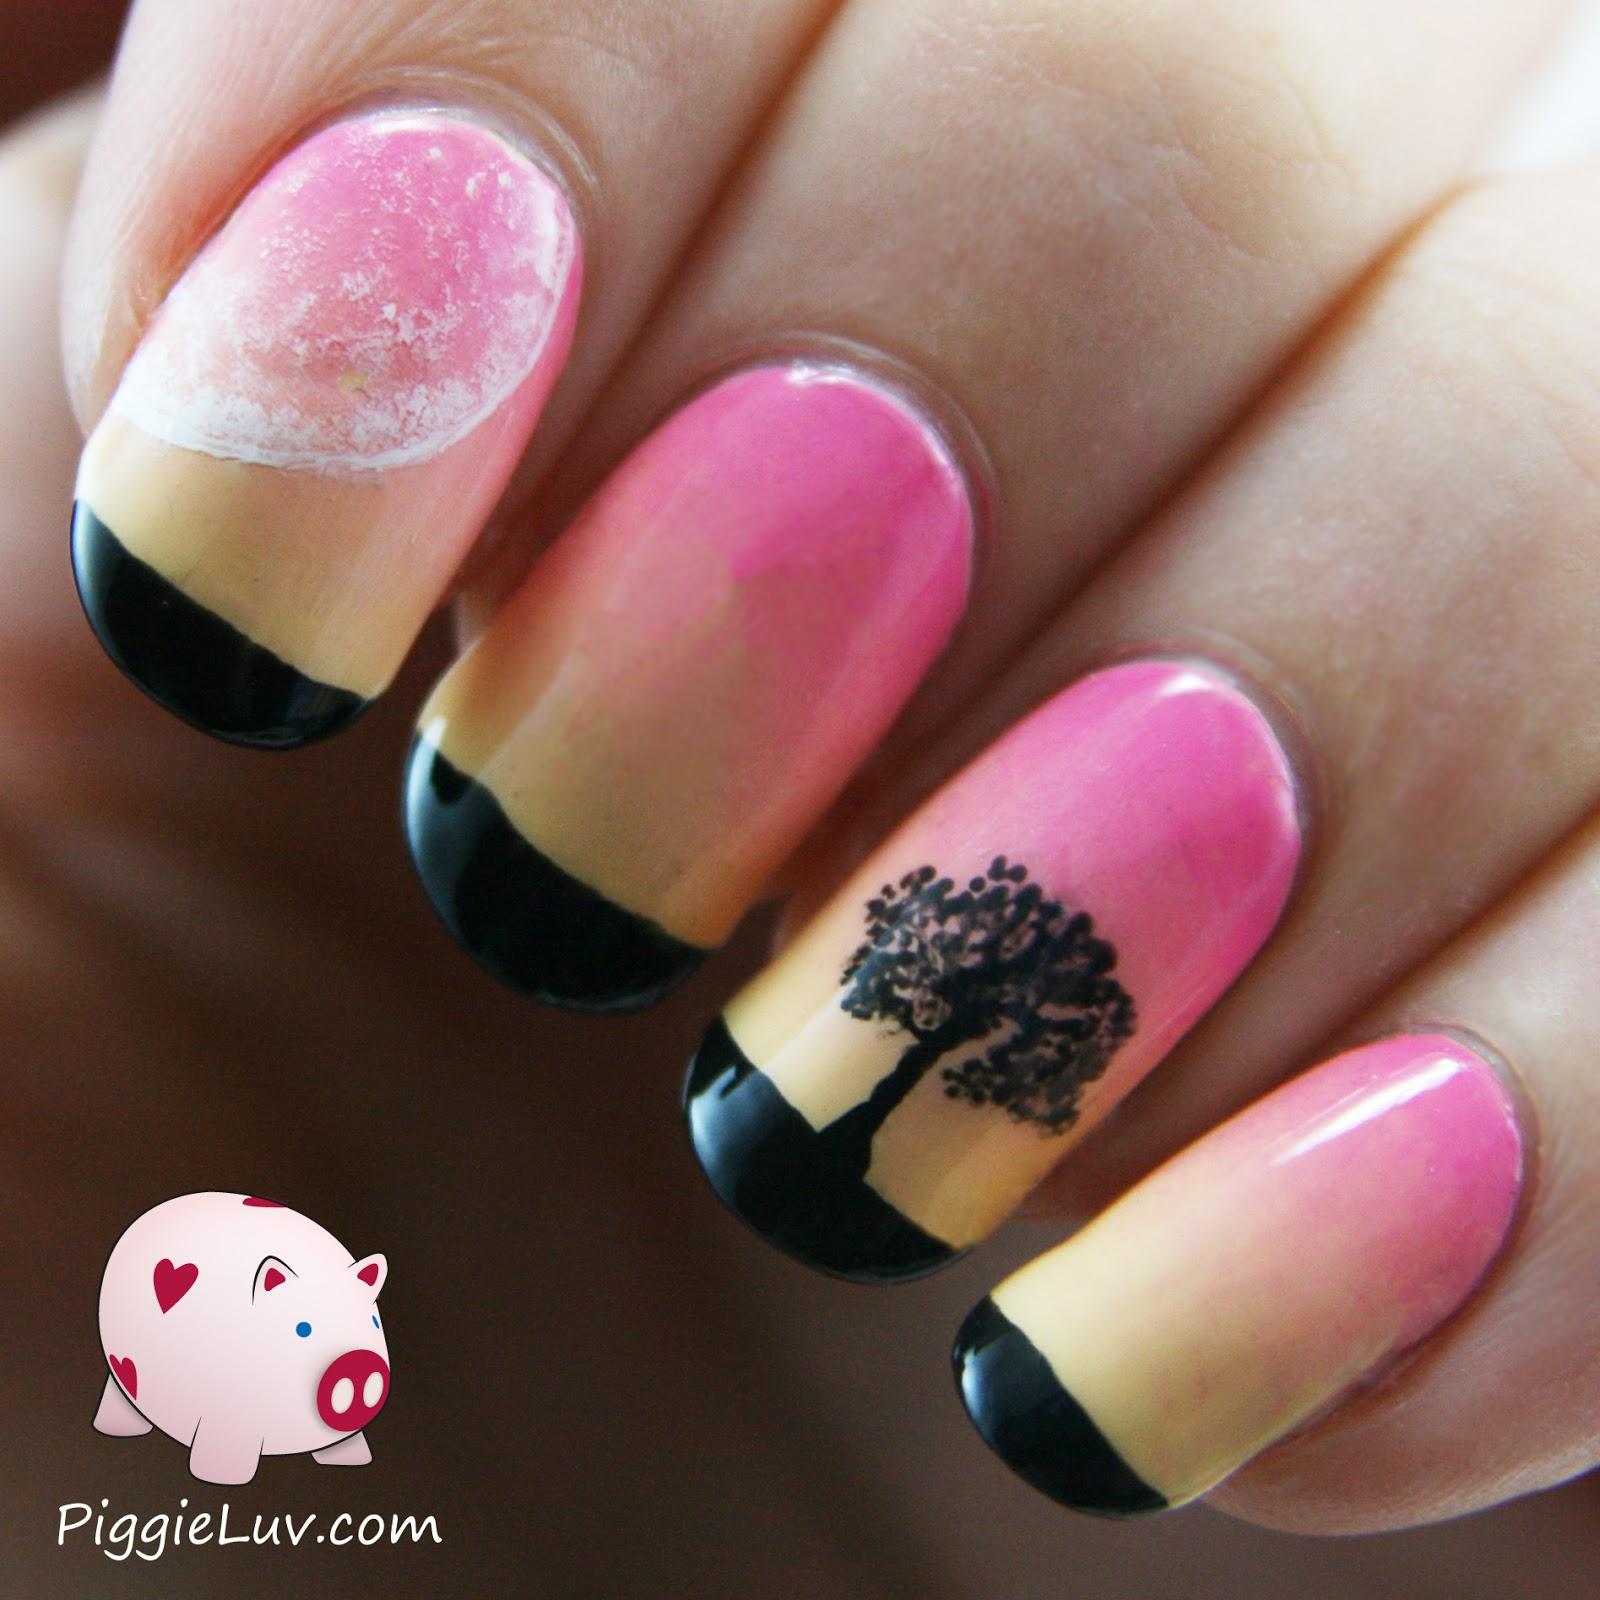 Gradient Nail Art: PiggieLuv: Soft Sunset Gradient Nail Art